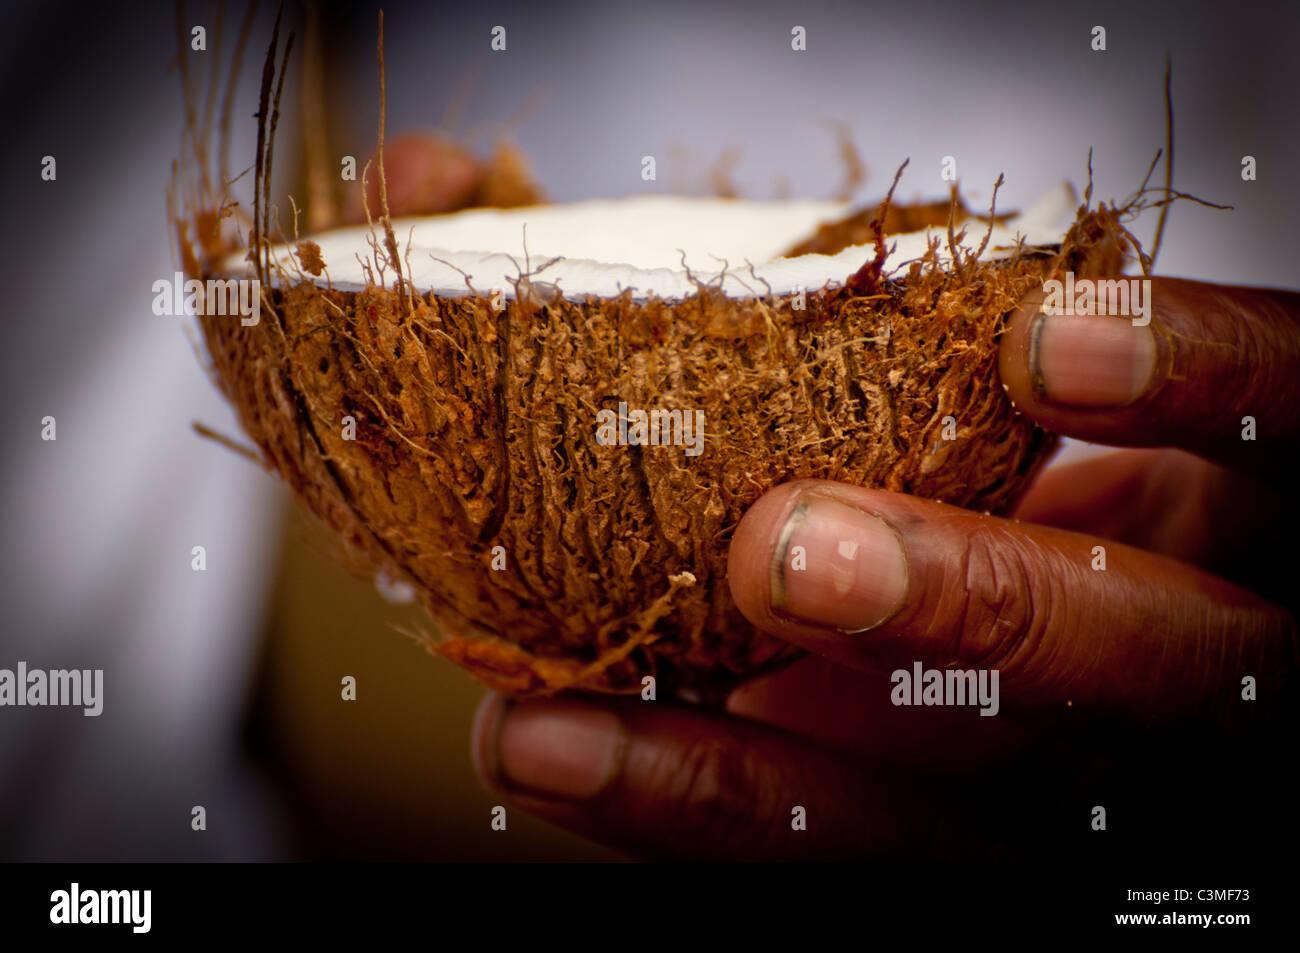 Fijian waiter serving freshly cracked coconut milk, Malolo Resort, Mamanucas Islands, Fiji - Stock Image